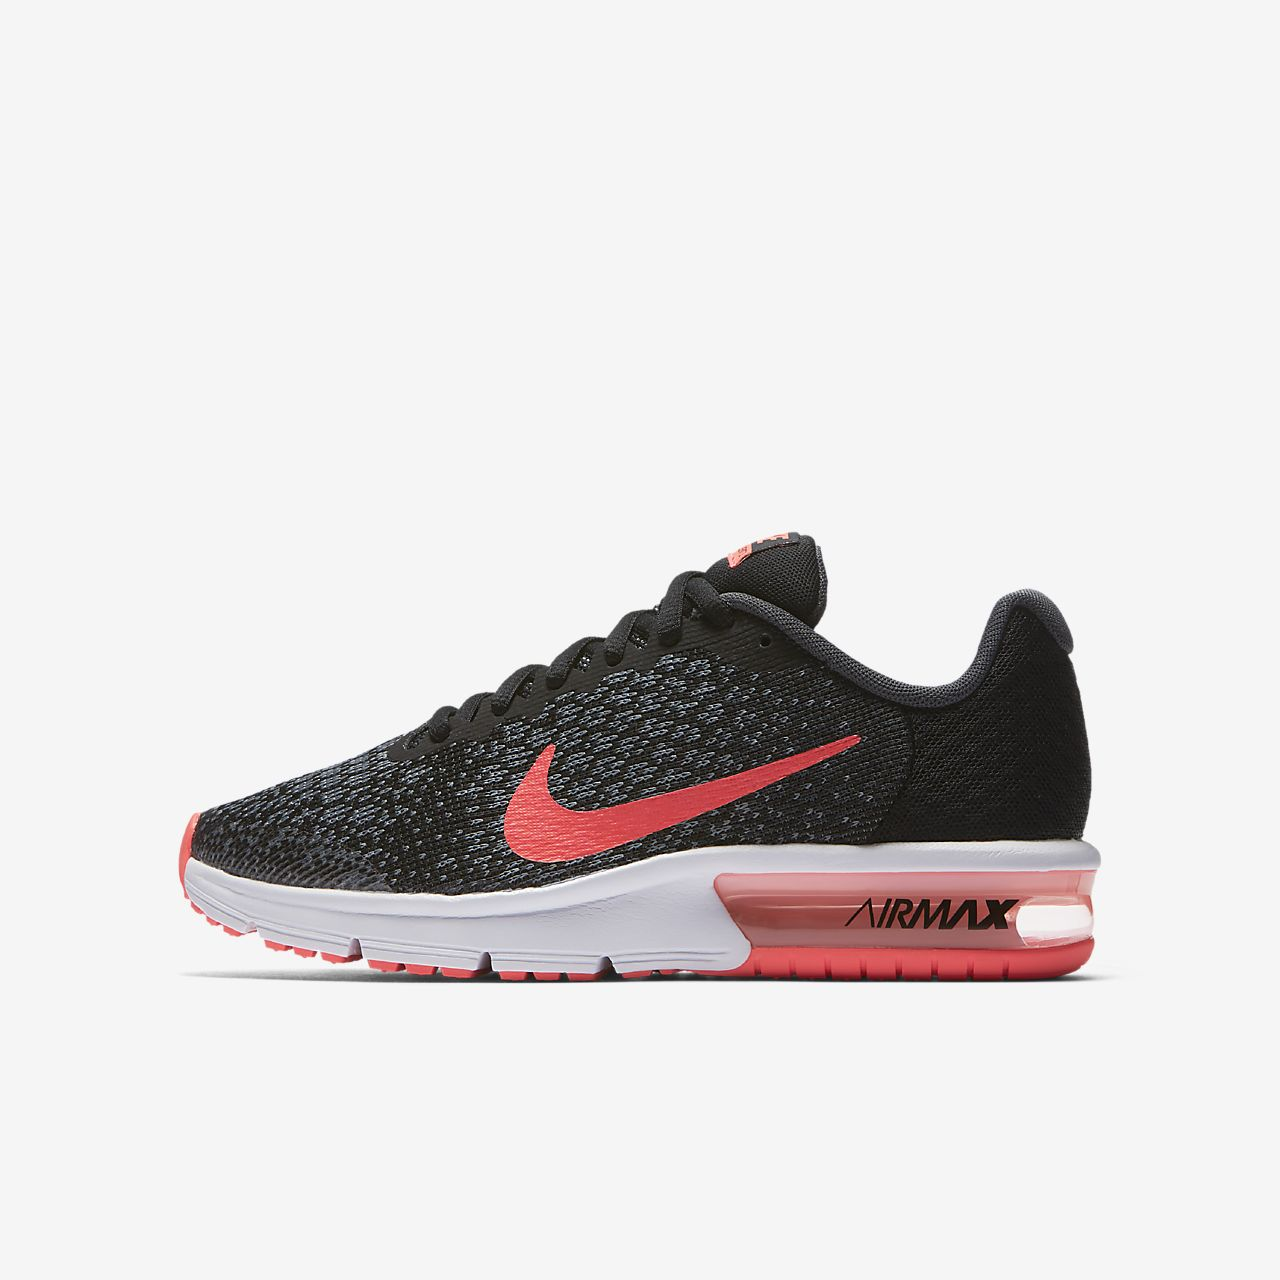 f299c1b3f9 Nike Air Max Sequent 2 Older Kids' Running Shoe. Nike.com AU